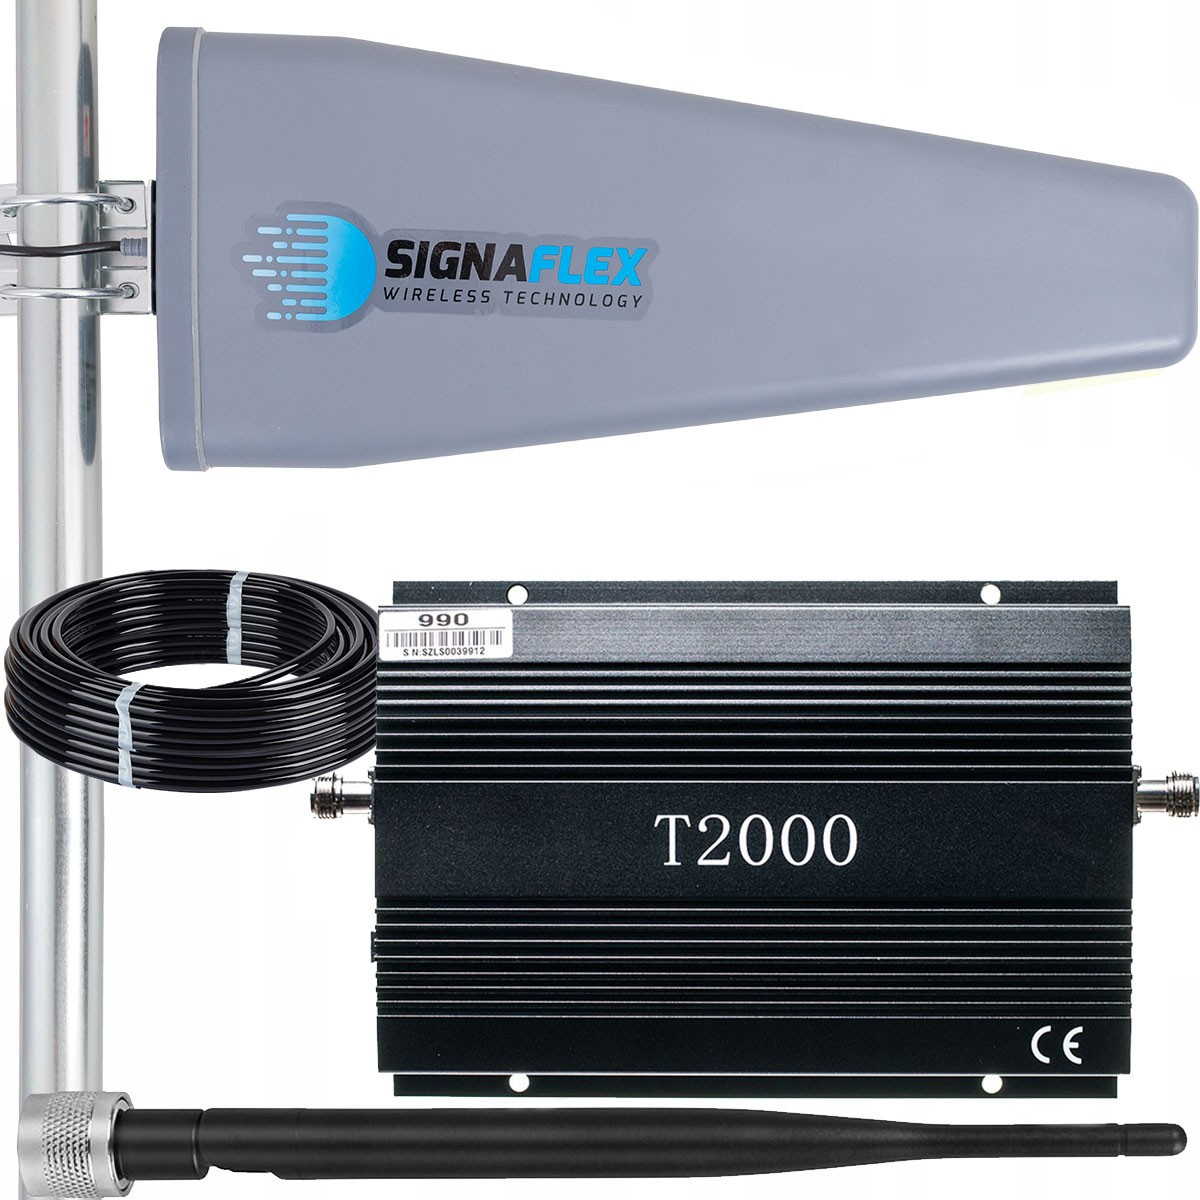 Komplet: wzmacniacz GSM T2000 + Tajfun II 15m z bat